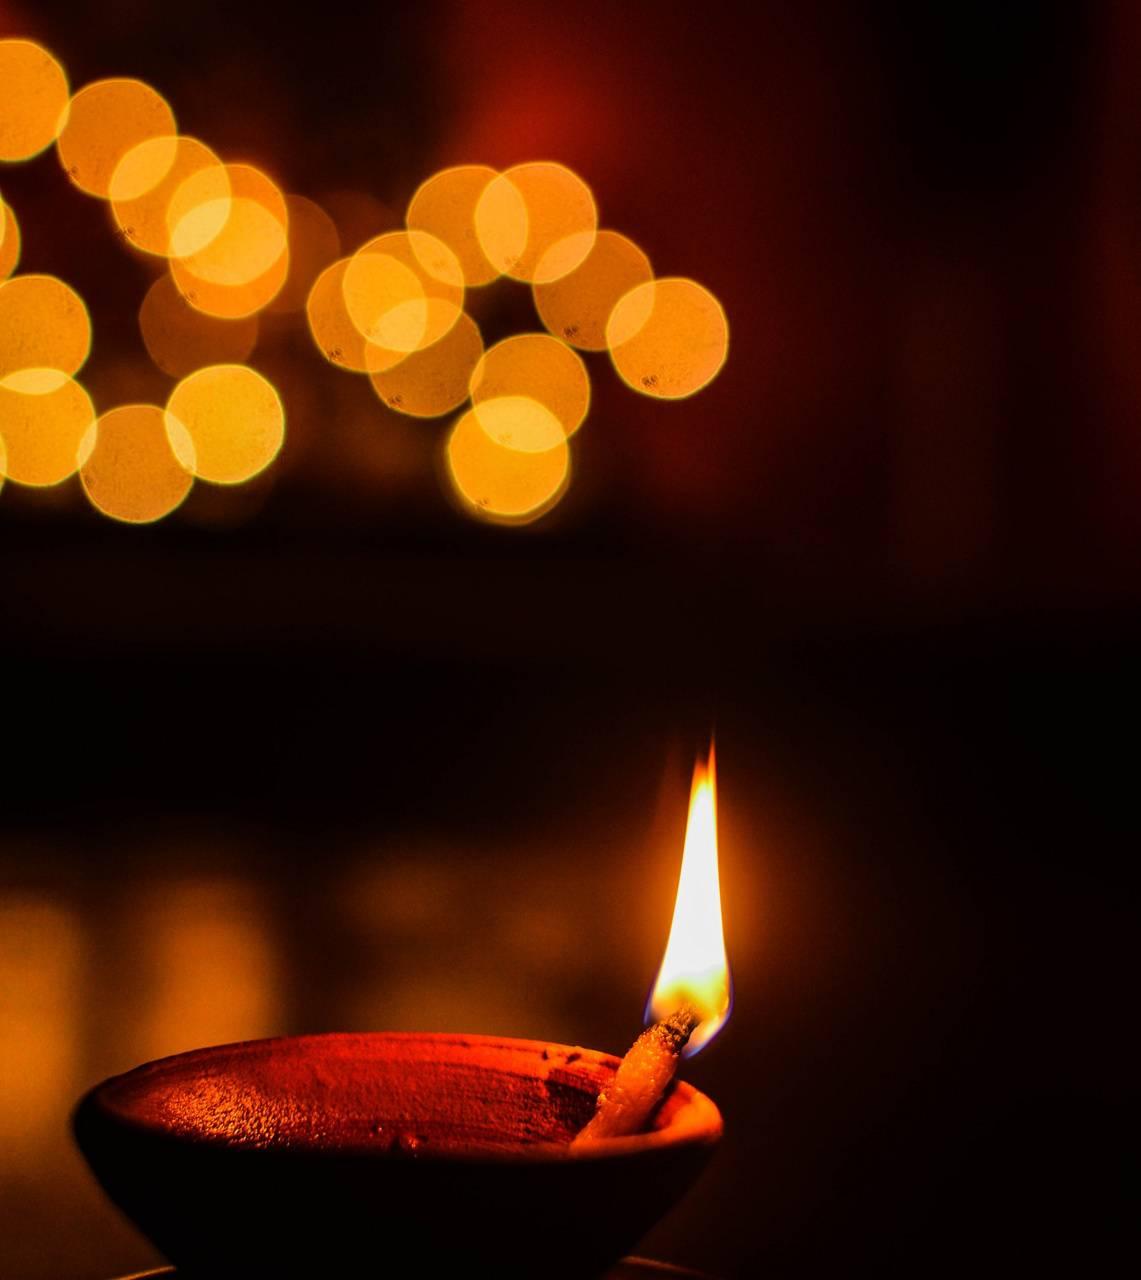 Diwali night lamp